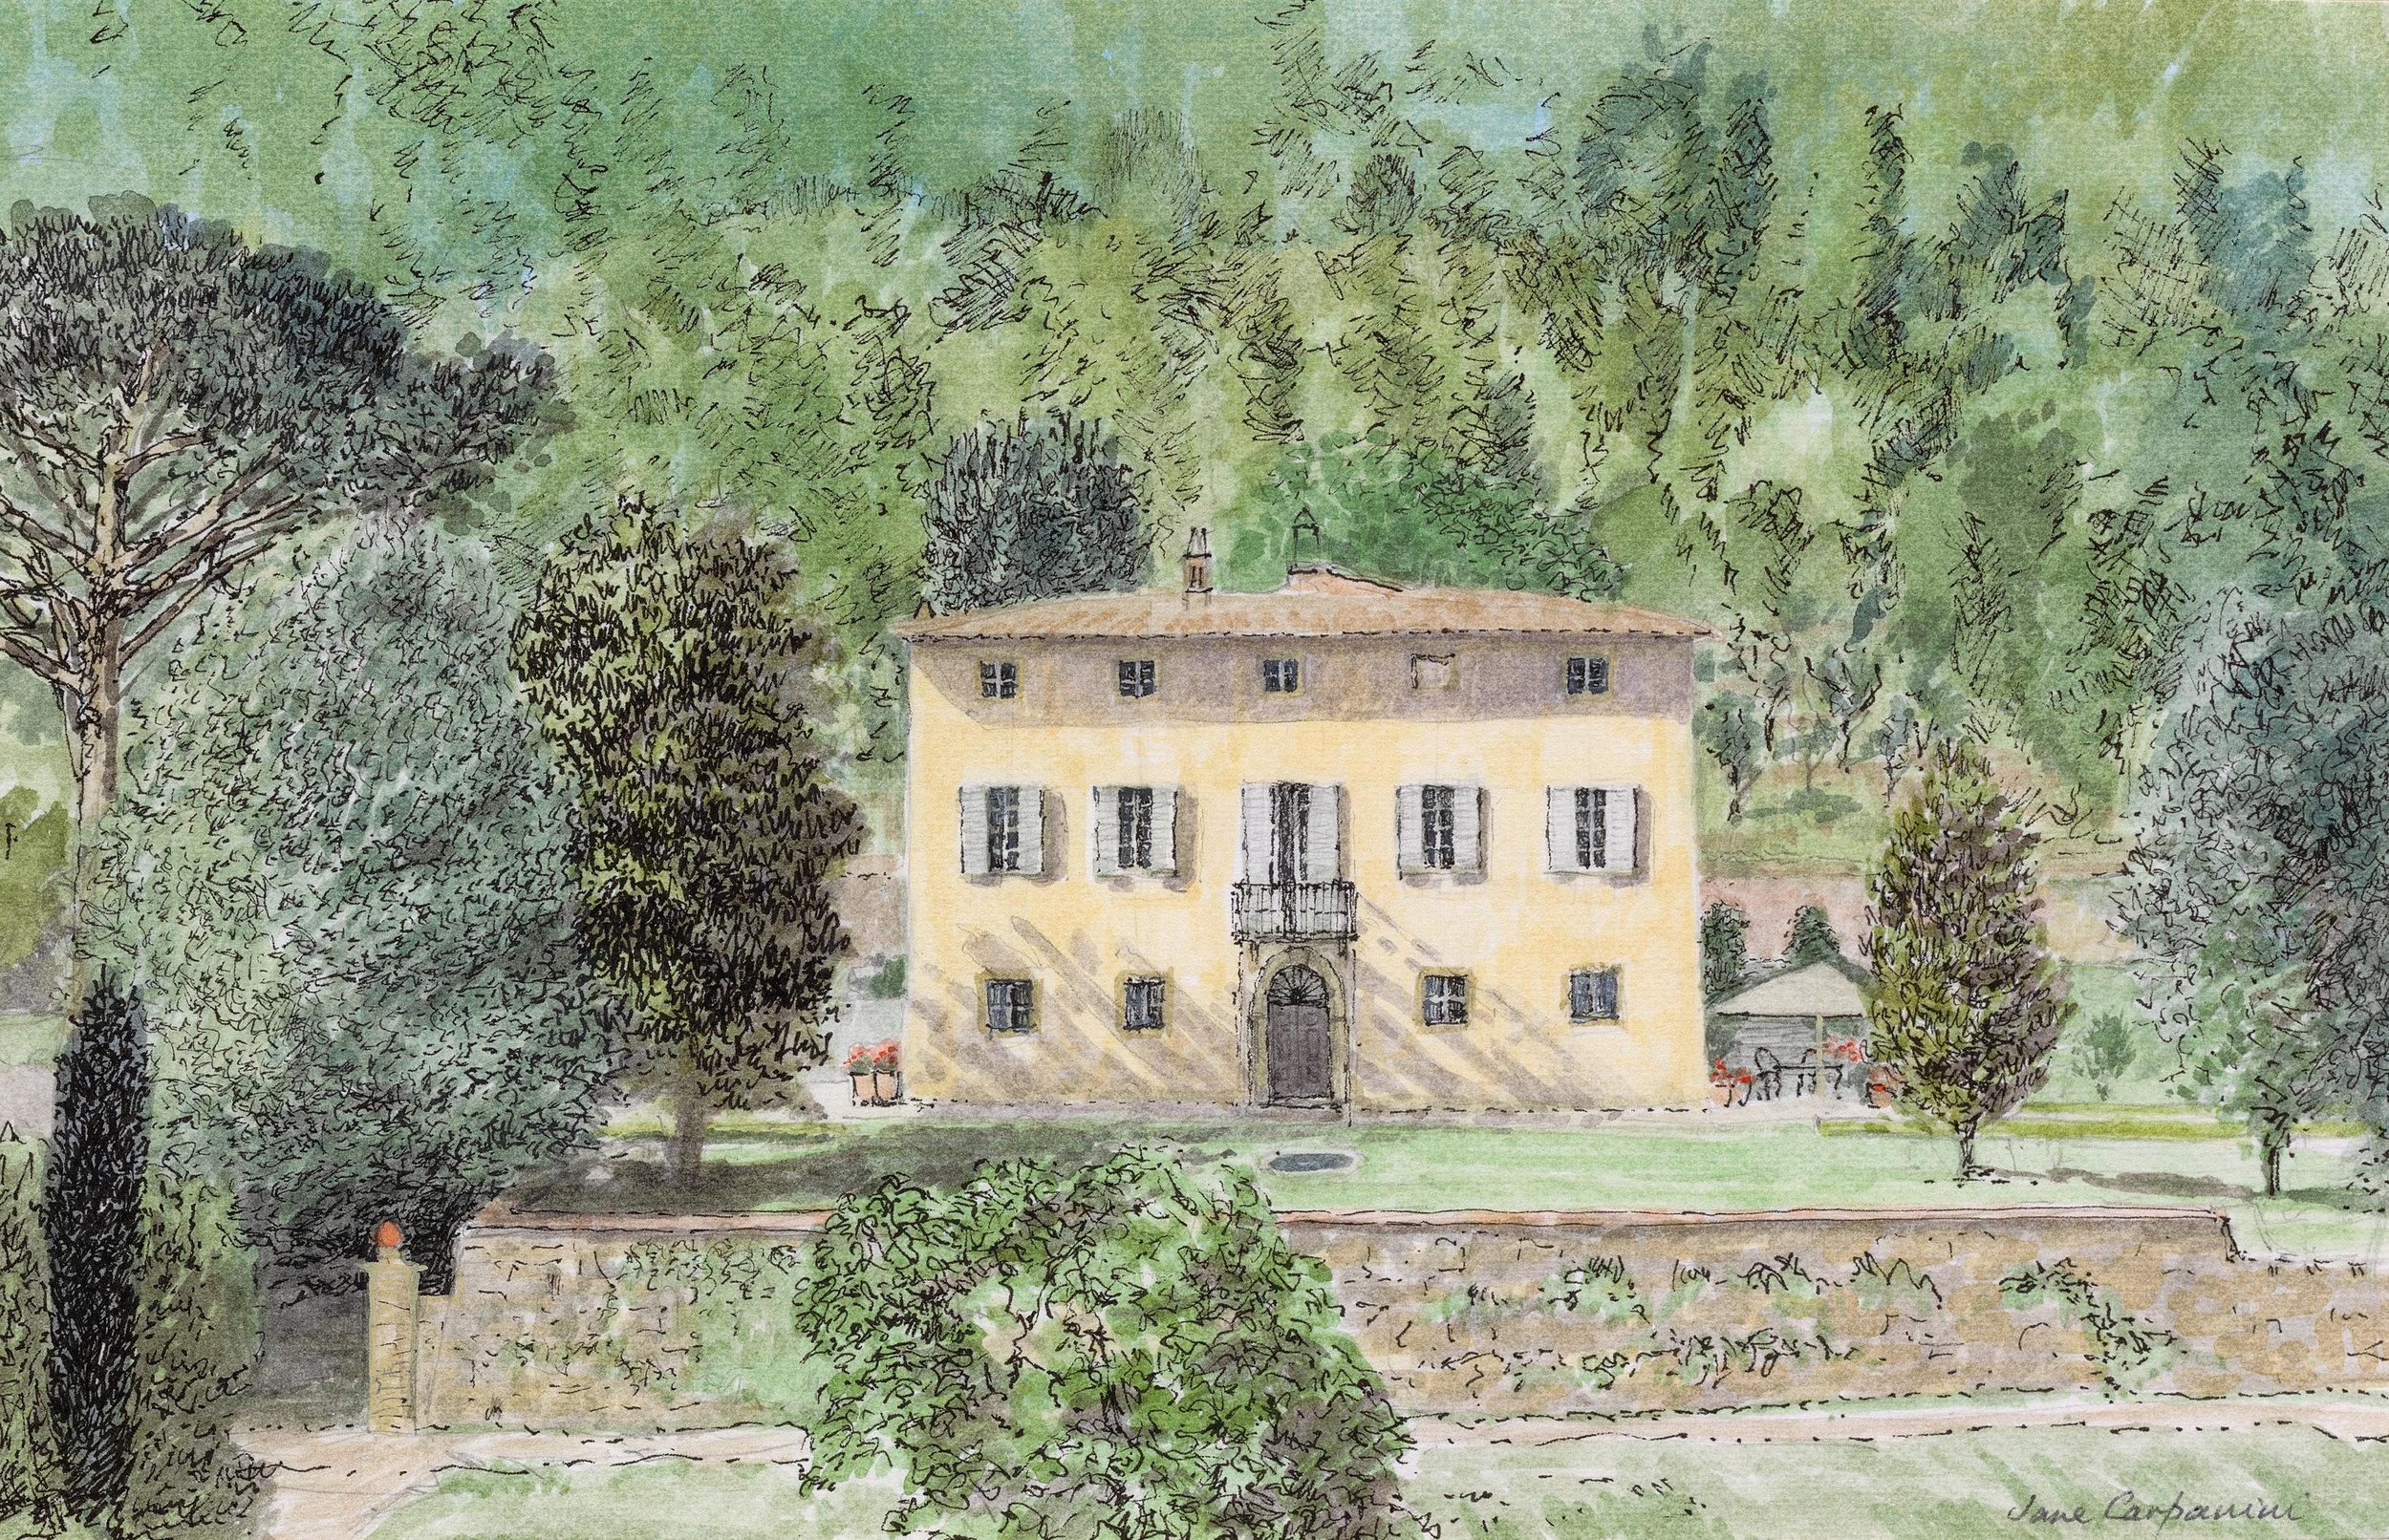 Tuscany Yoga Retreat - Our Tuscan Villa - La Dolce Vigna  Wine Tours